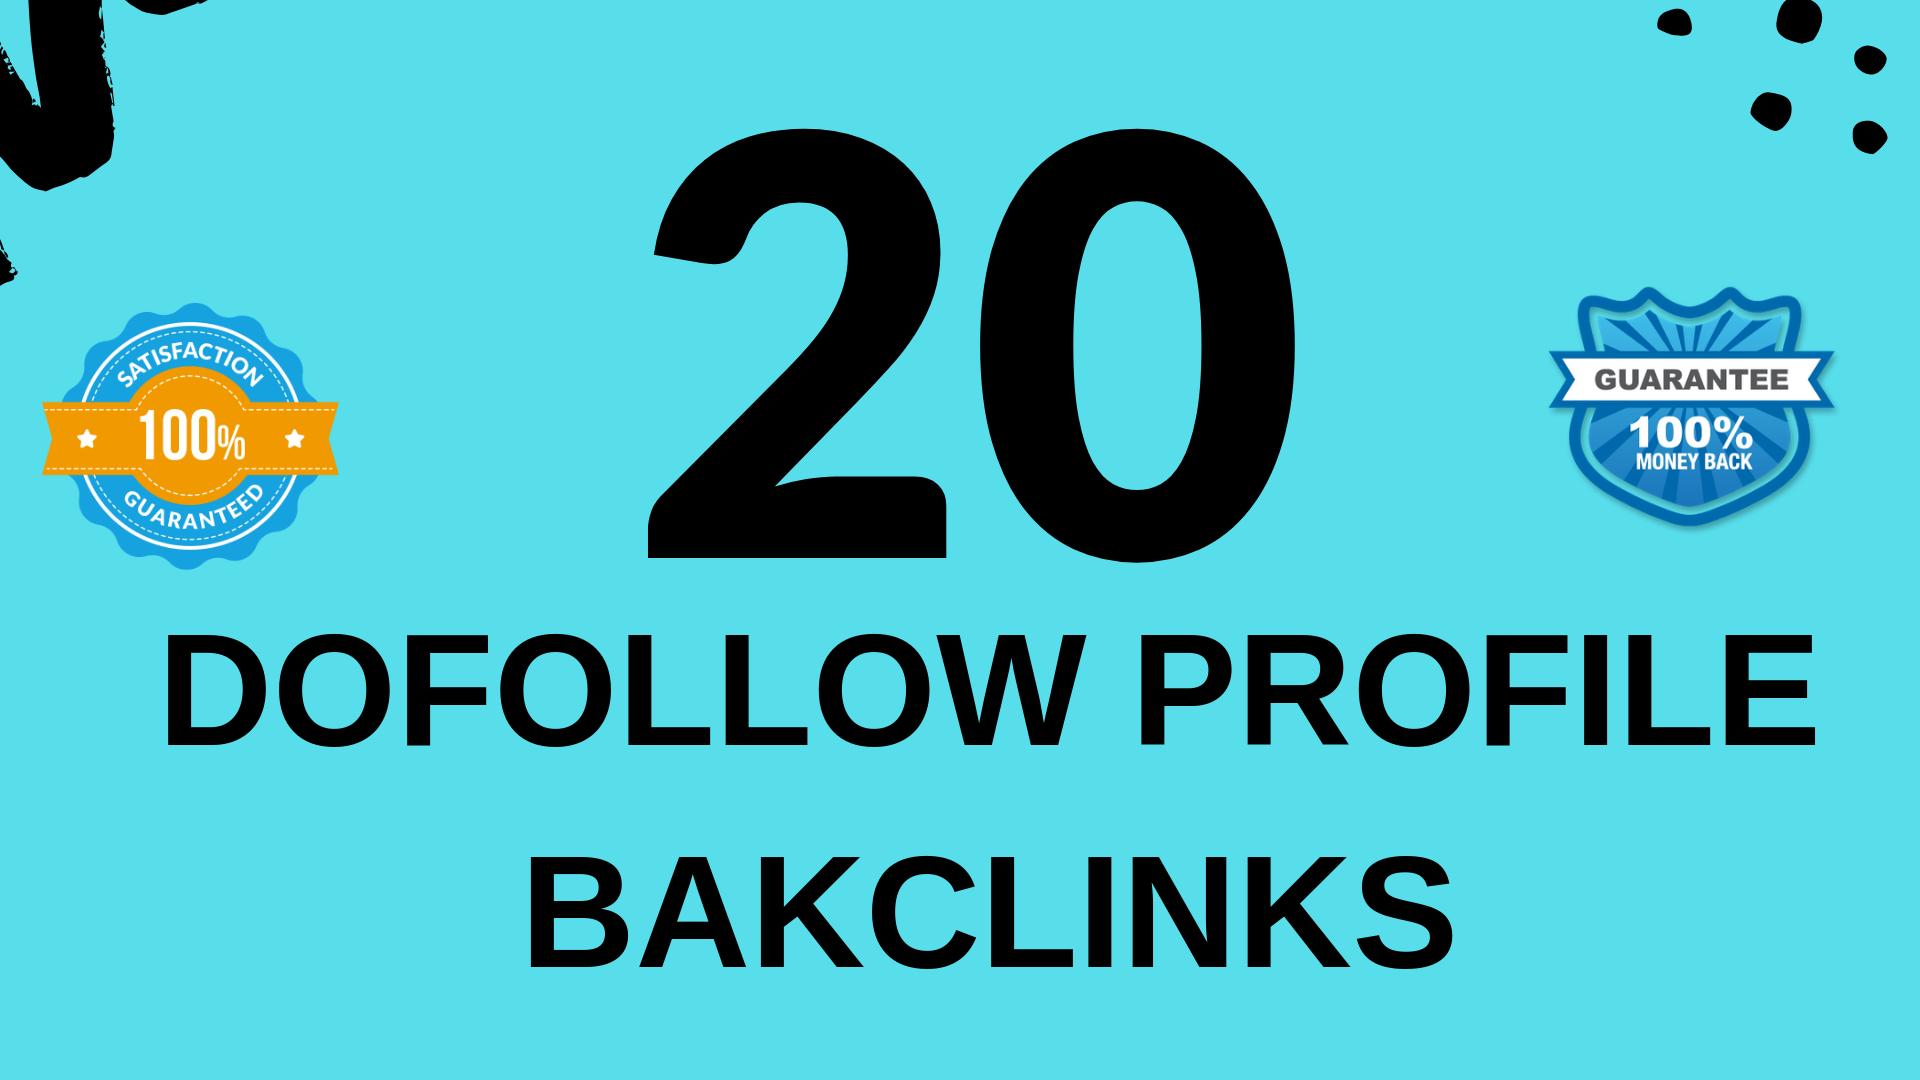 Create 20 dofollow profile backlinks